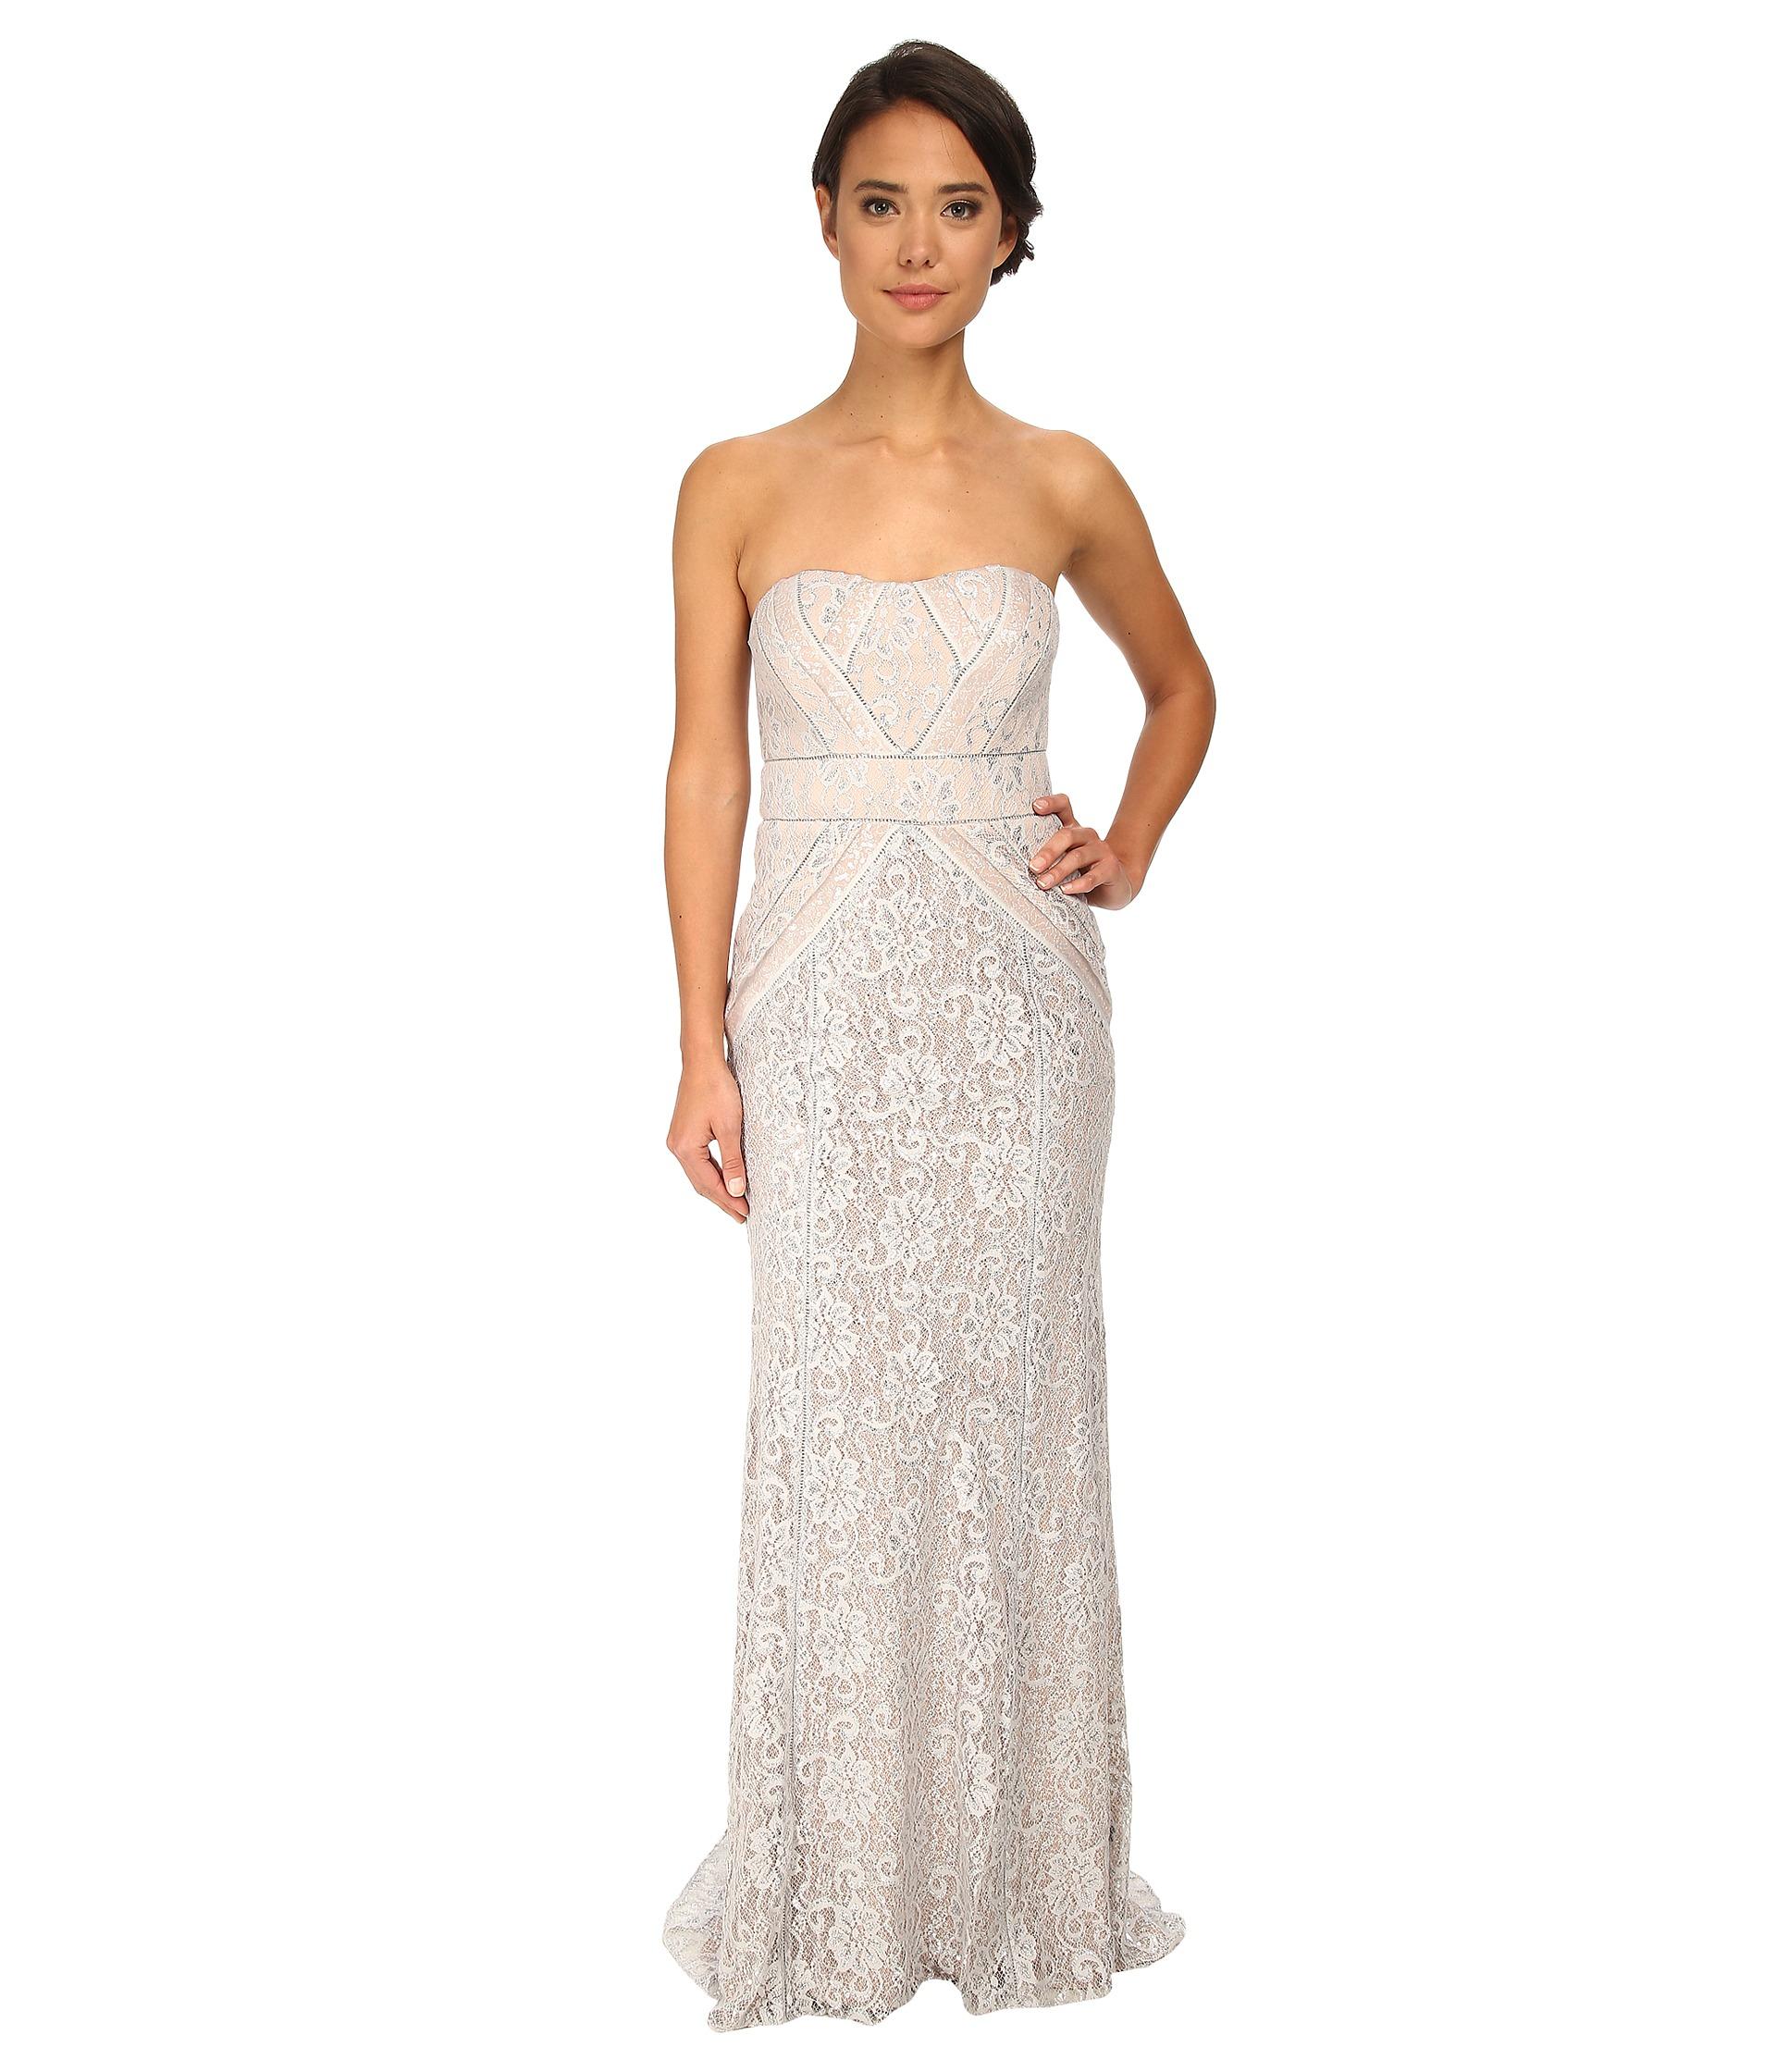 64e0e59c7d90 Lyst - Badgley Mischka Strapless Metallic Lace Runway Gown in Metallic